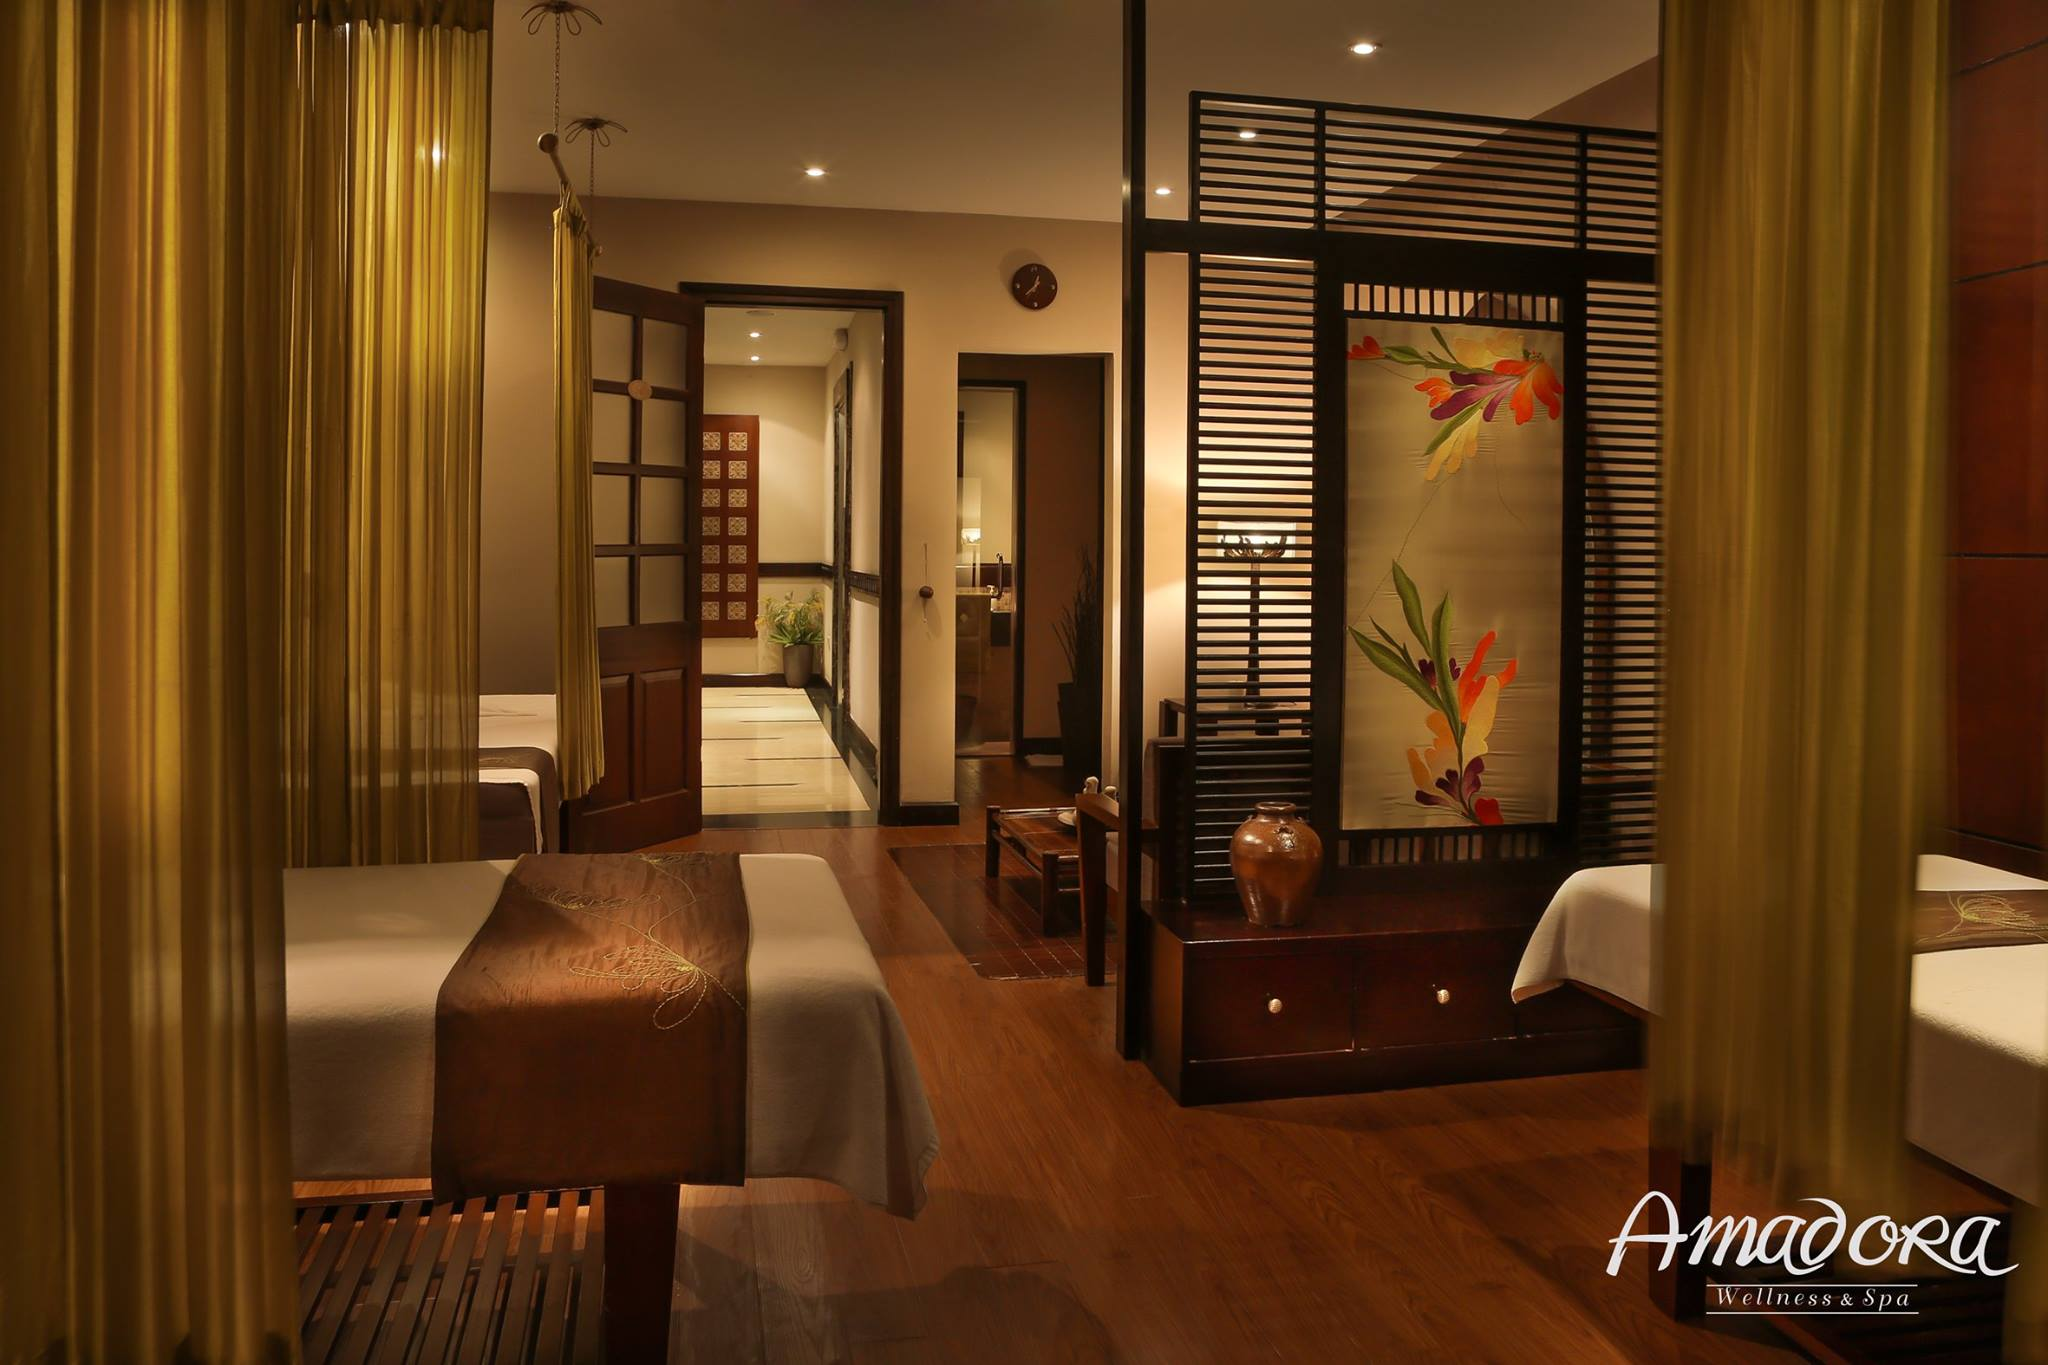 Best Spa In Hanoi - Amadora